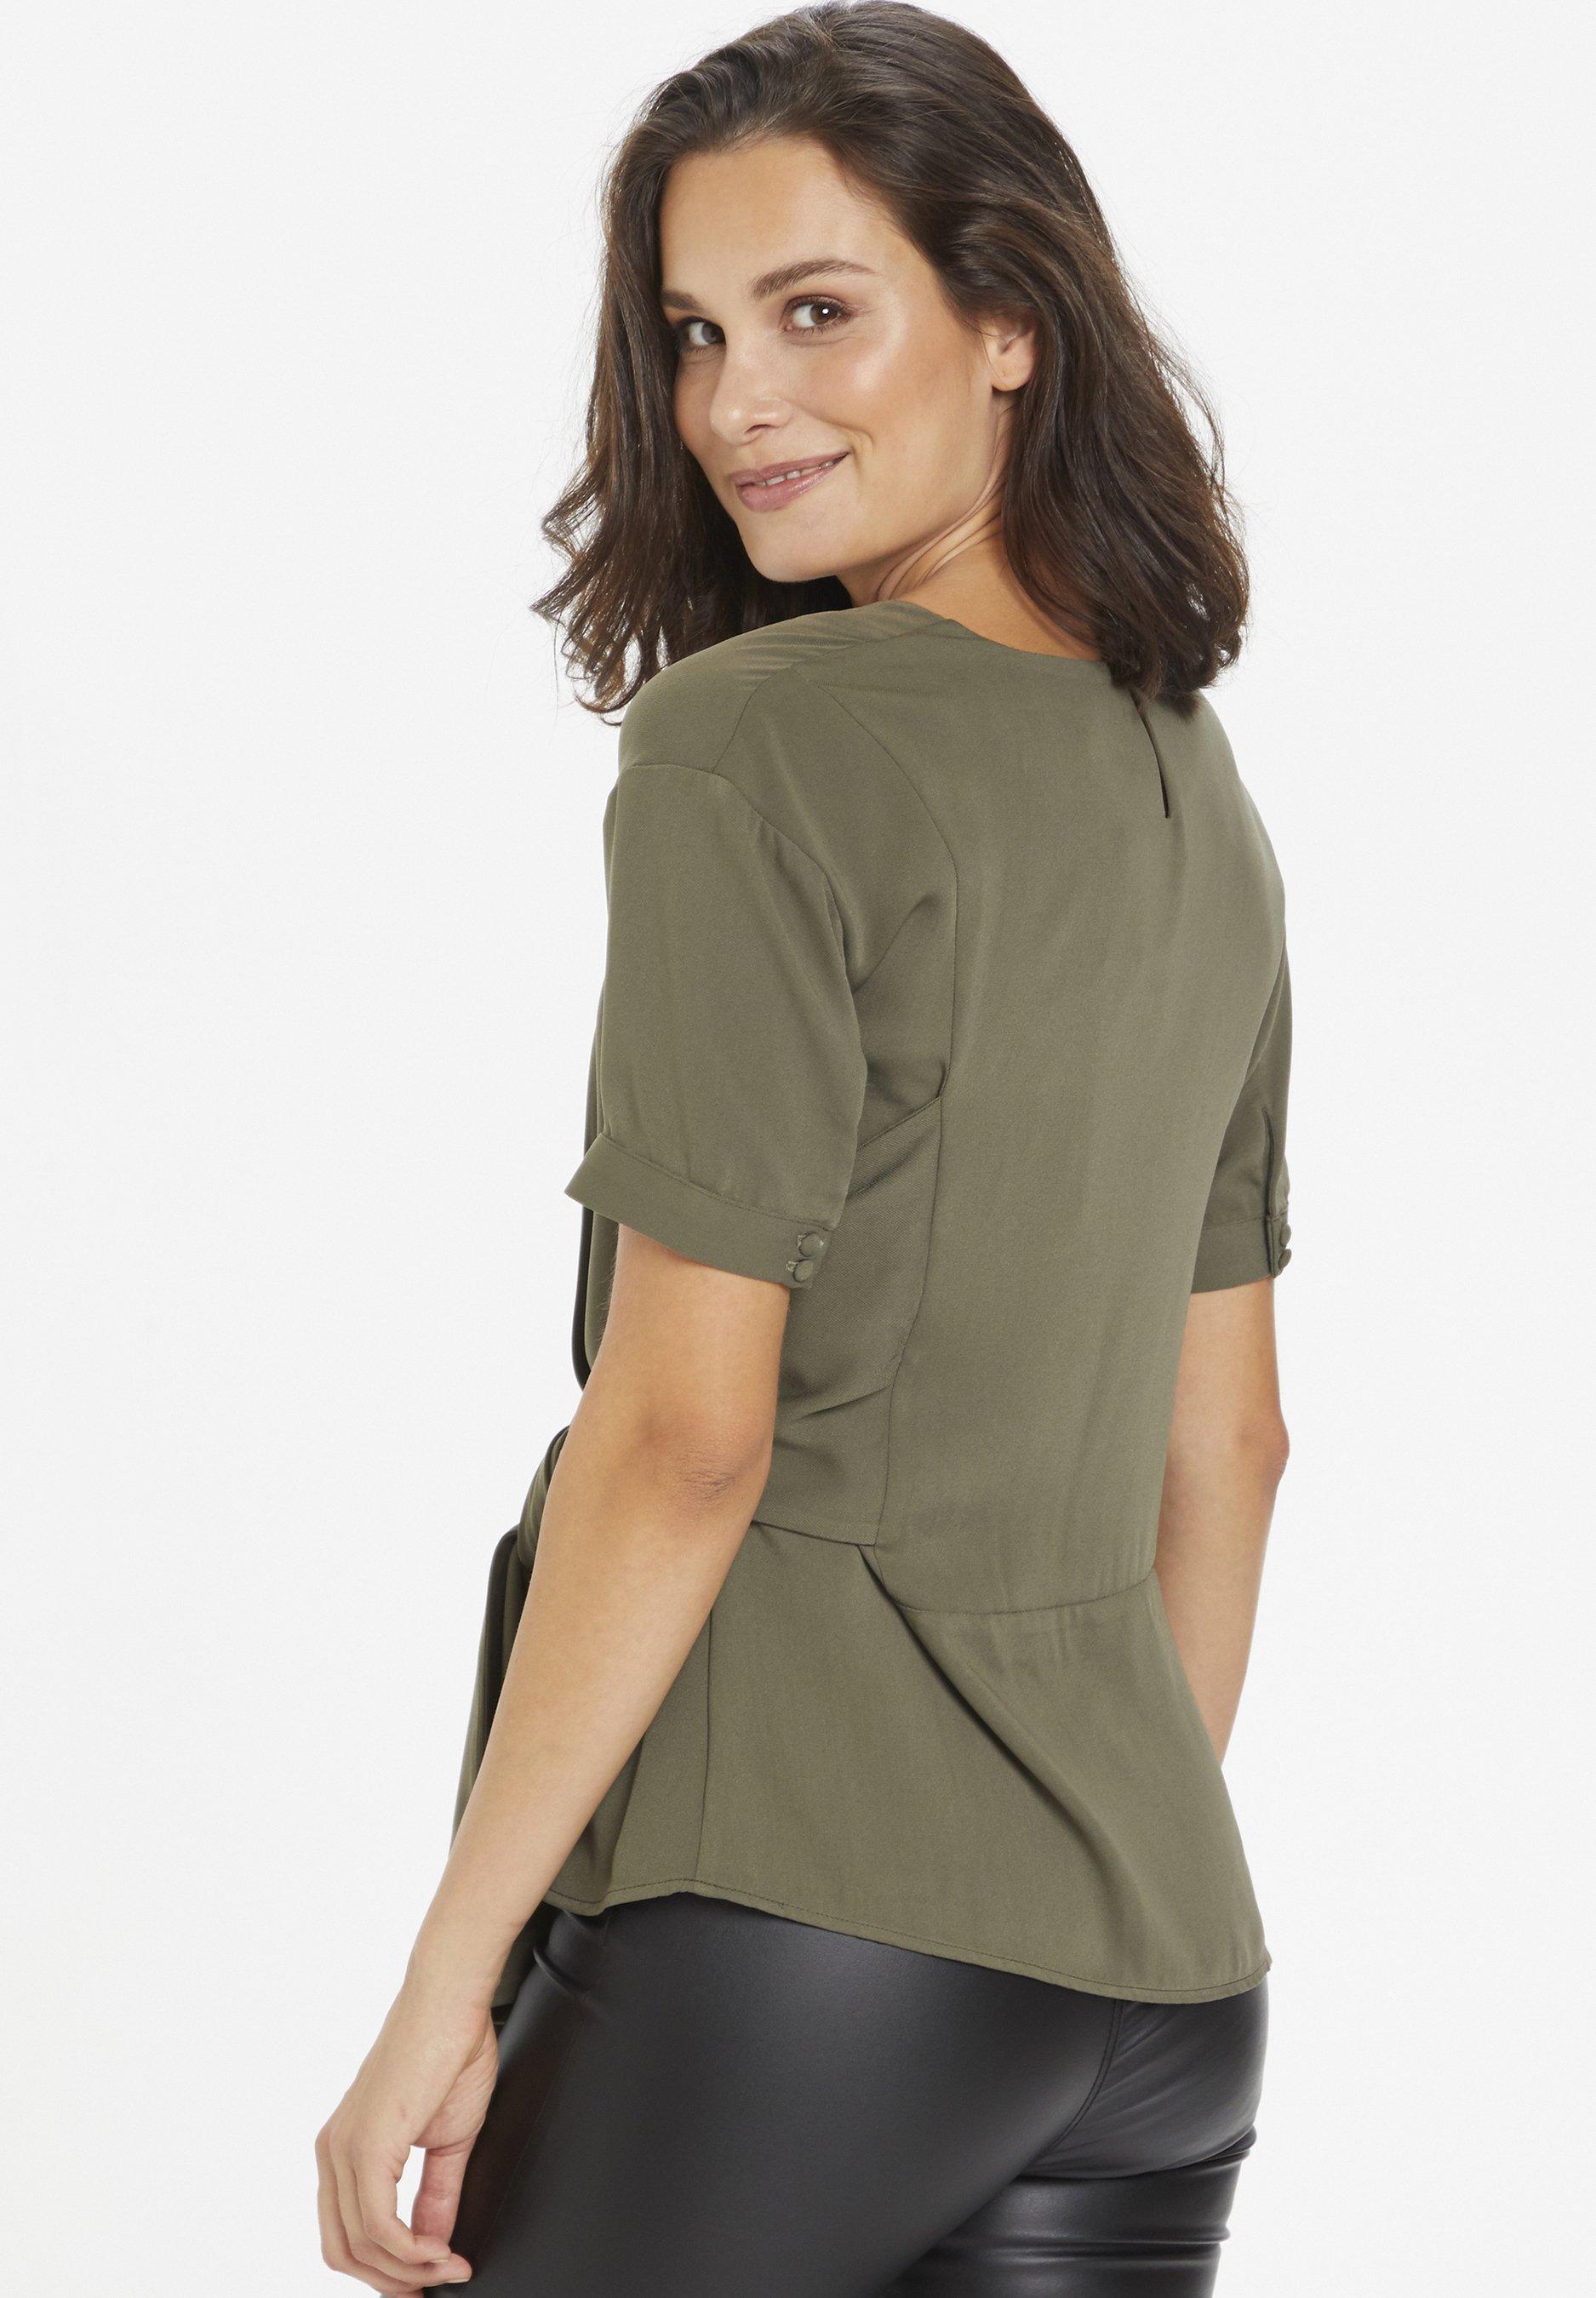 Affordable Particular Discount Women's Clothing Kaffe KALONA Blouse grape leaf Hcqymjnje 61a8r74ph